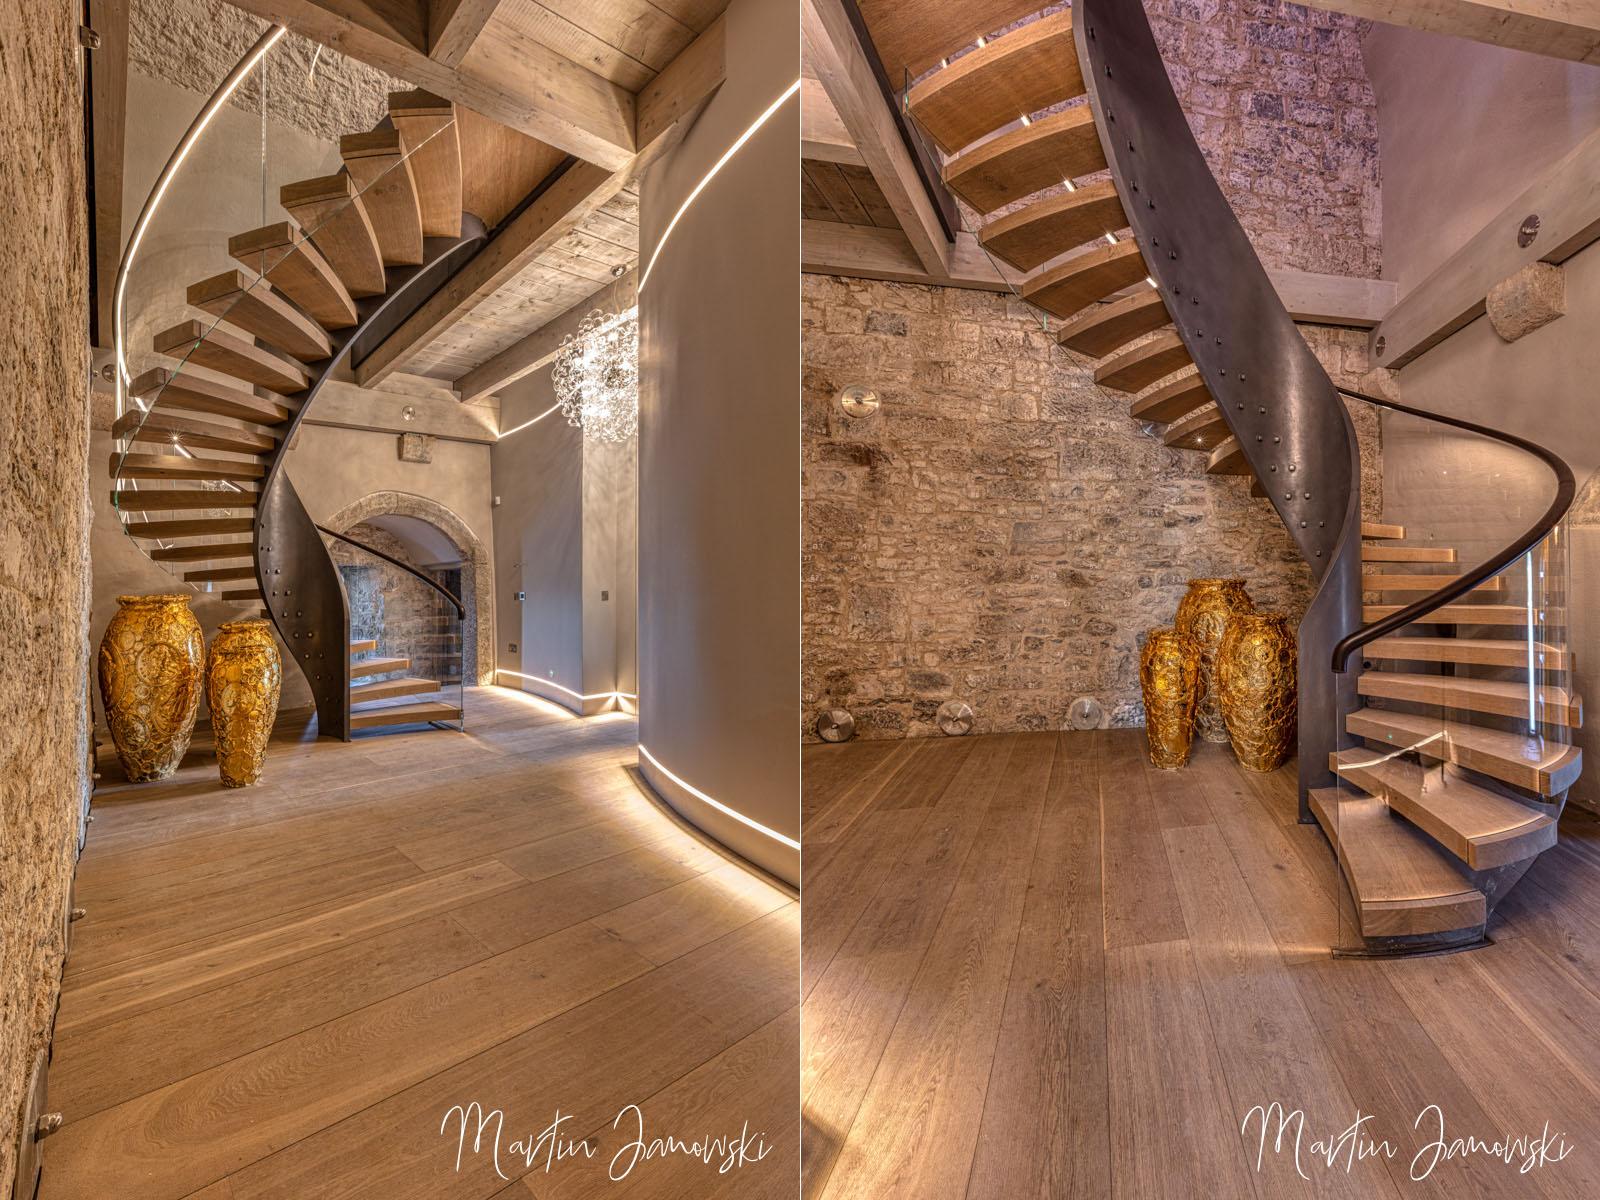 architectural photography - Martin Janowski